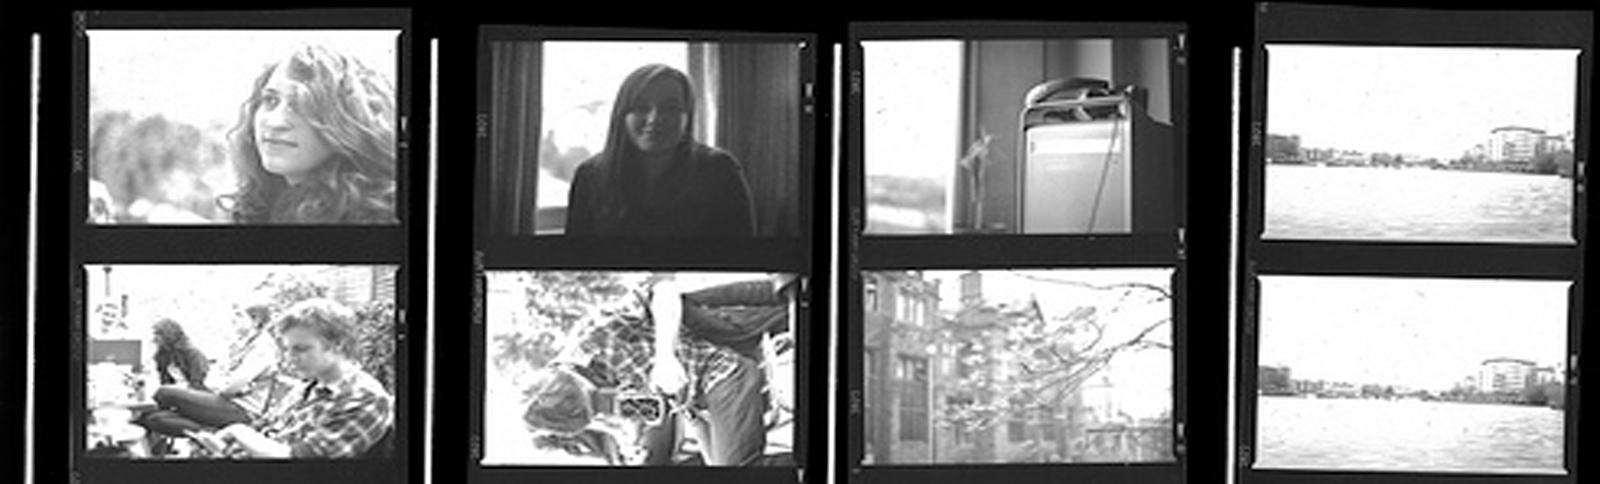 Medium Format Film Scanning Solutions in Oxfordshire UK